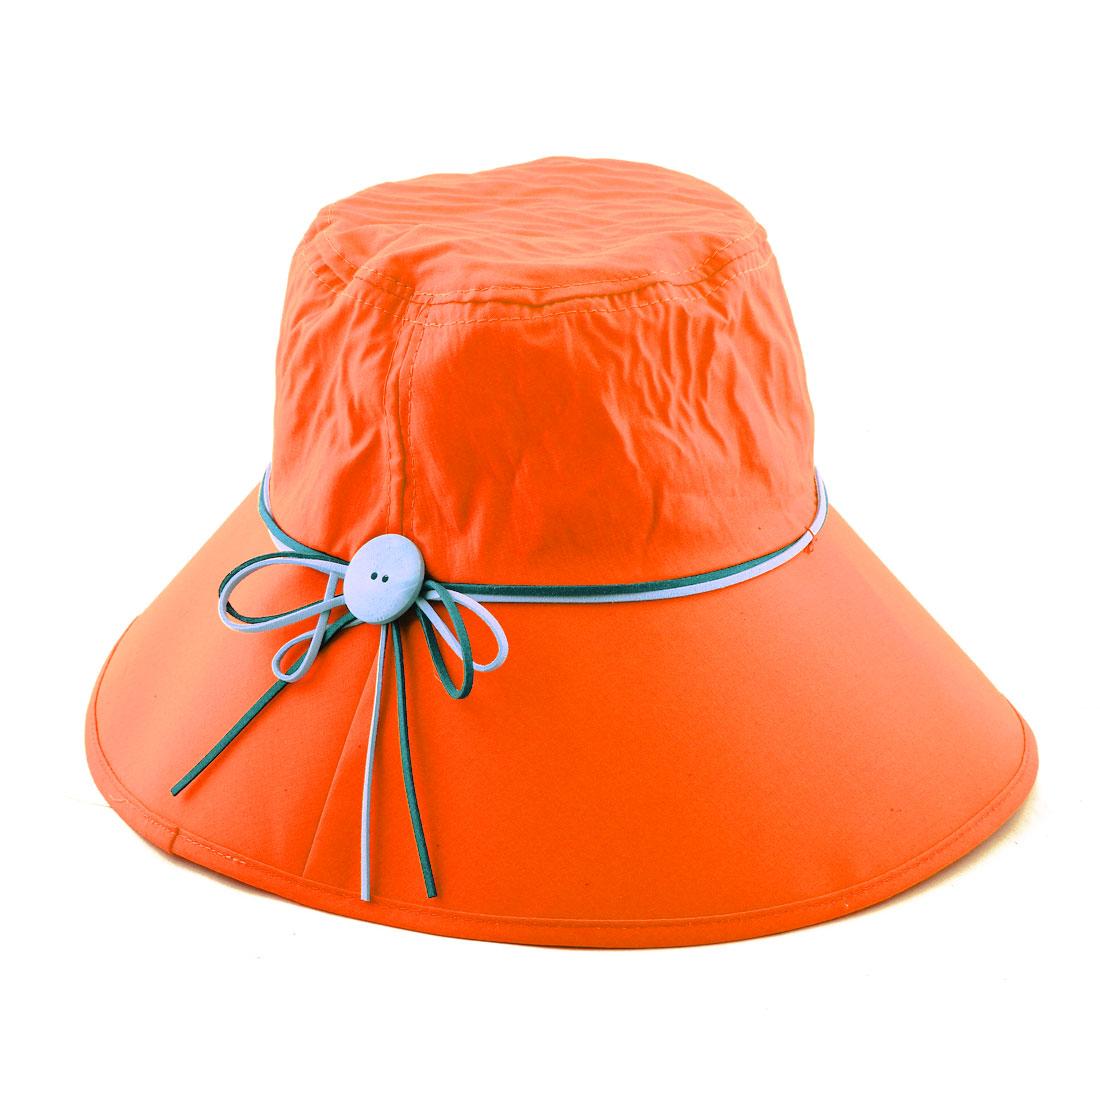 Woman Bowknot Wooden Buckle Decor Adjustable Wide Brim Summer Beach Cap Sun Hat Orange